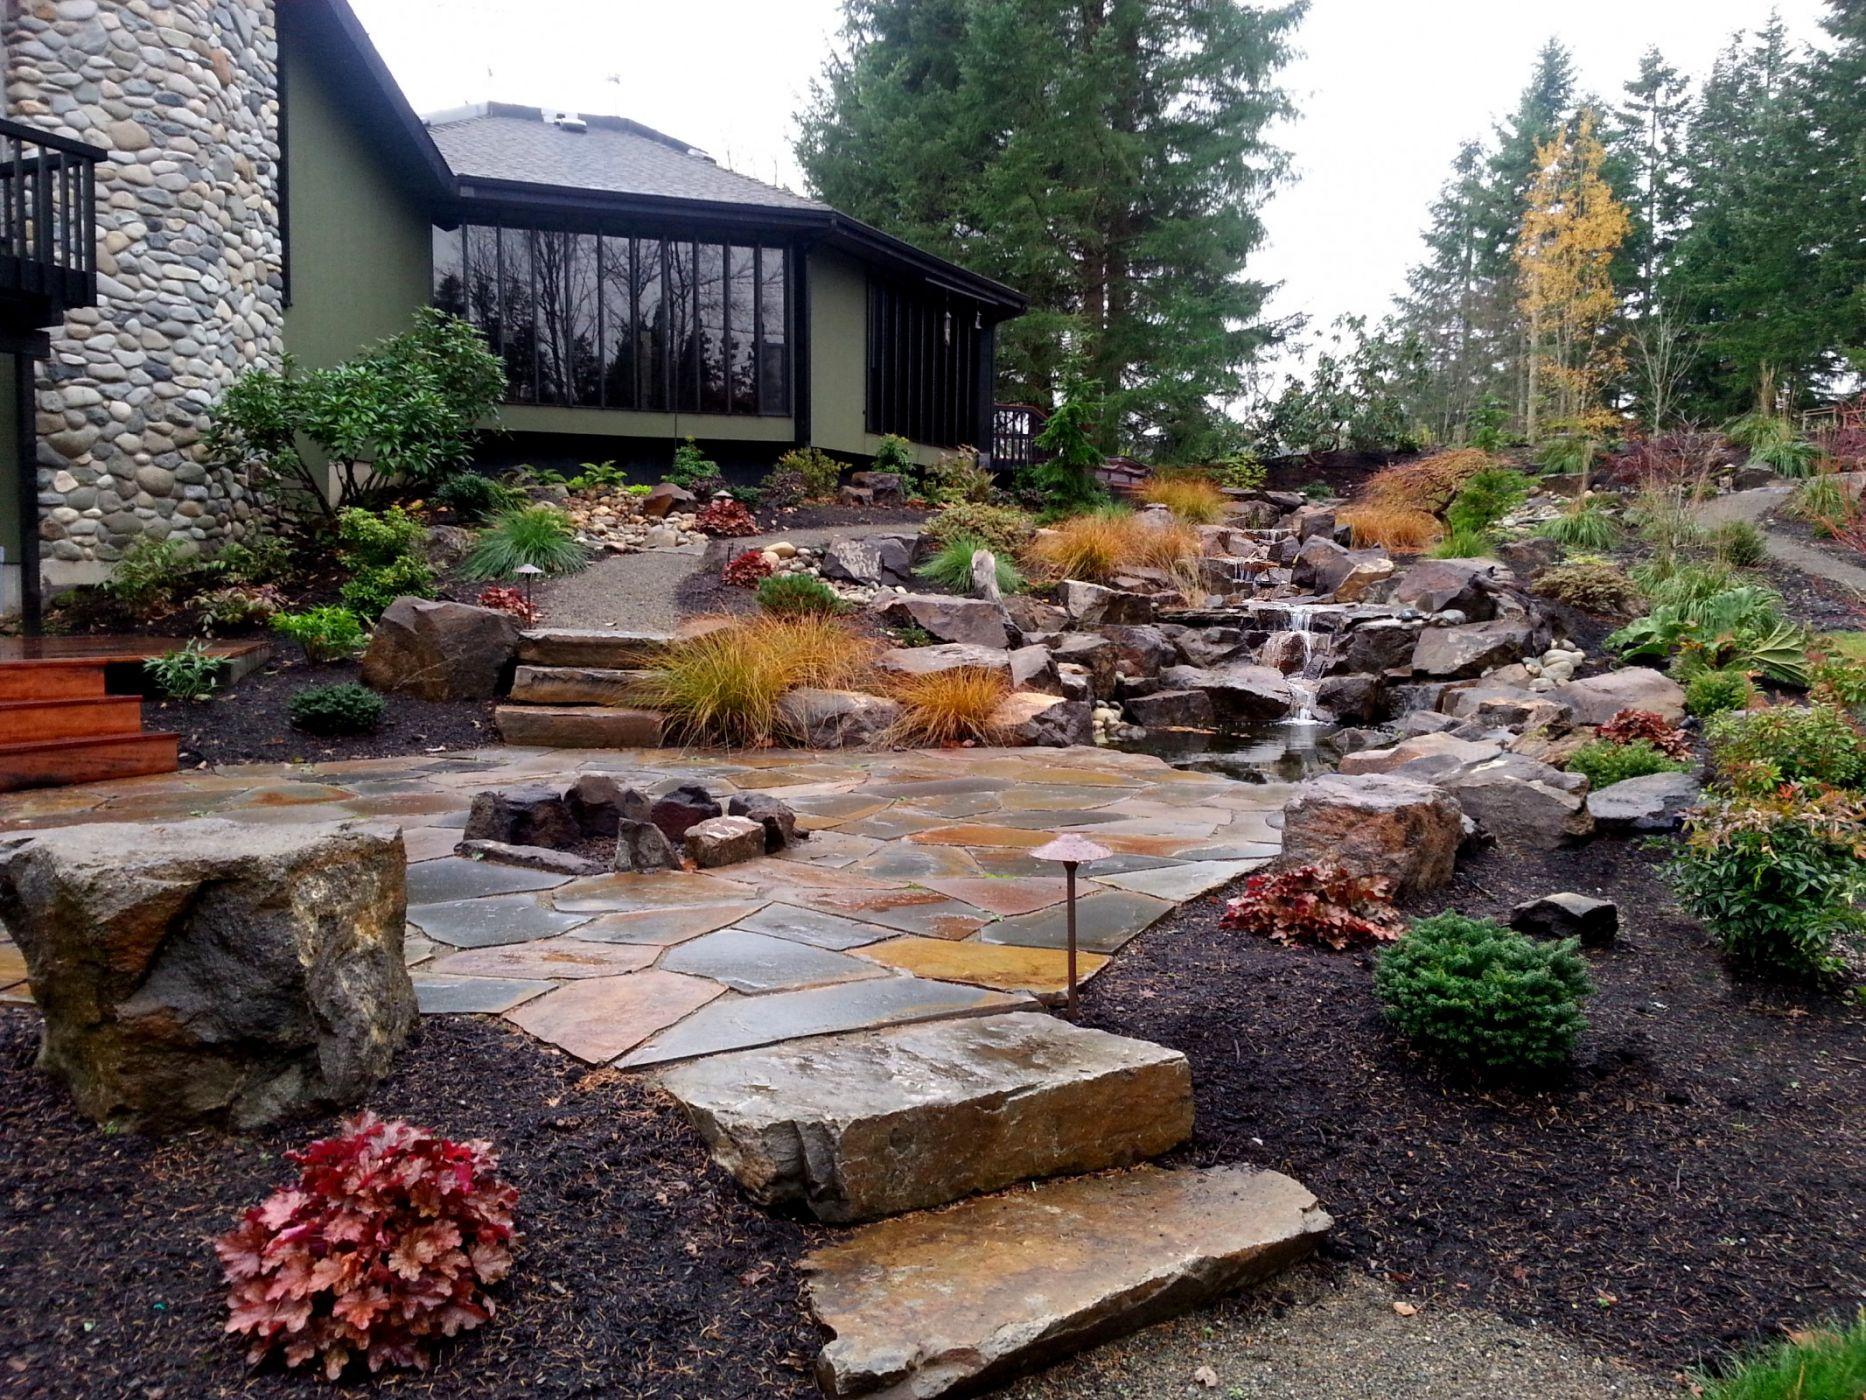 Snohomish landscape design | Sublime Garden Design | Landscape ...